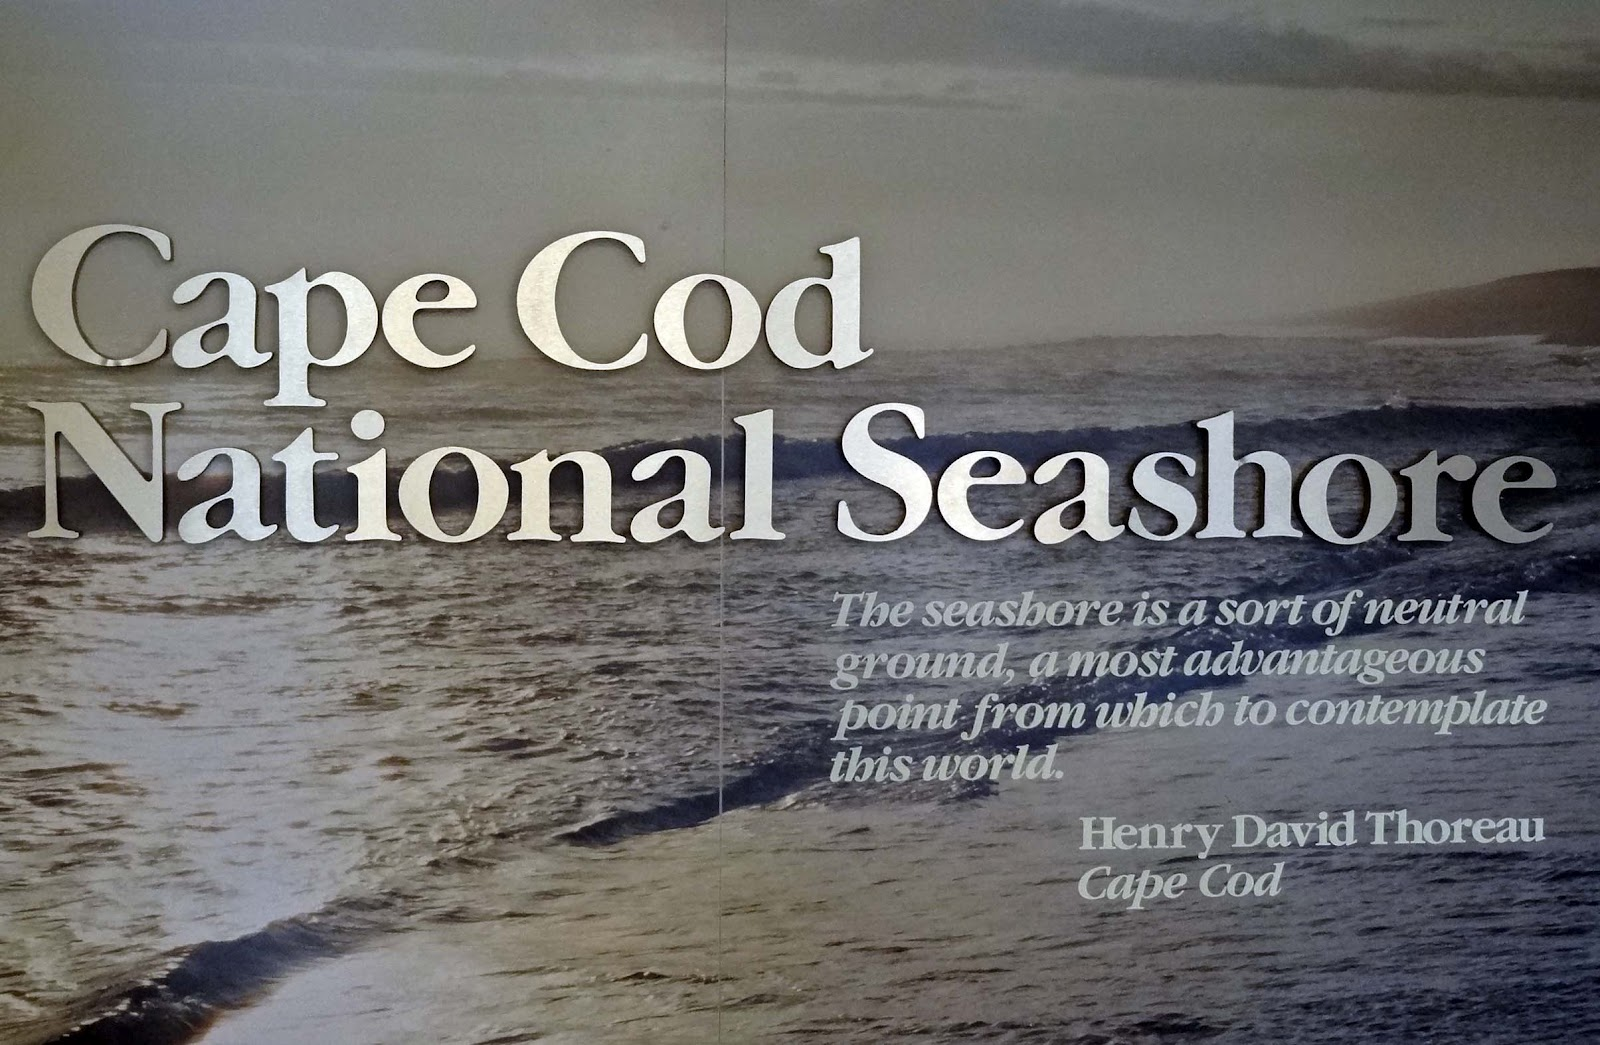 Best National Seashore Beach Cape Cod